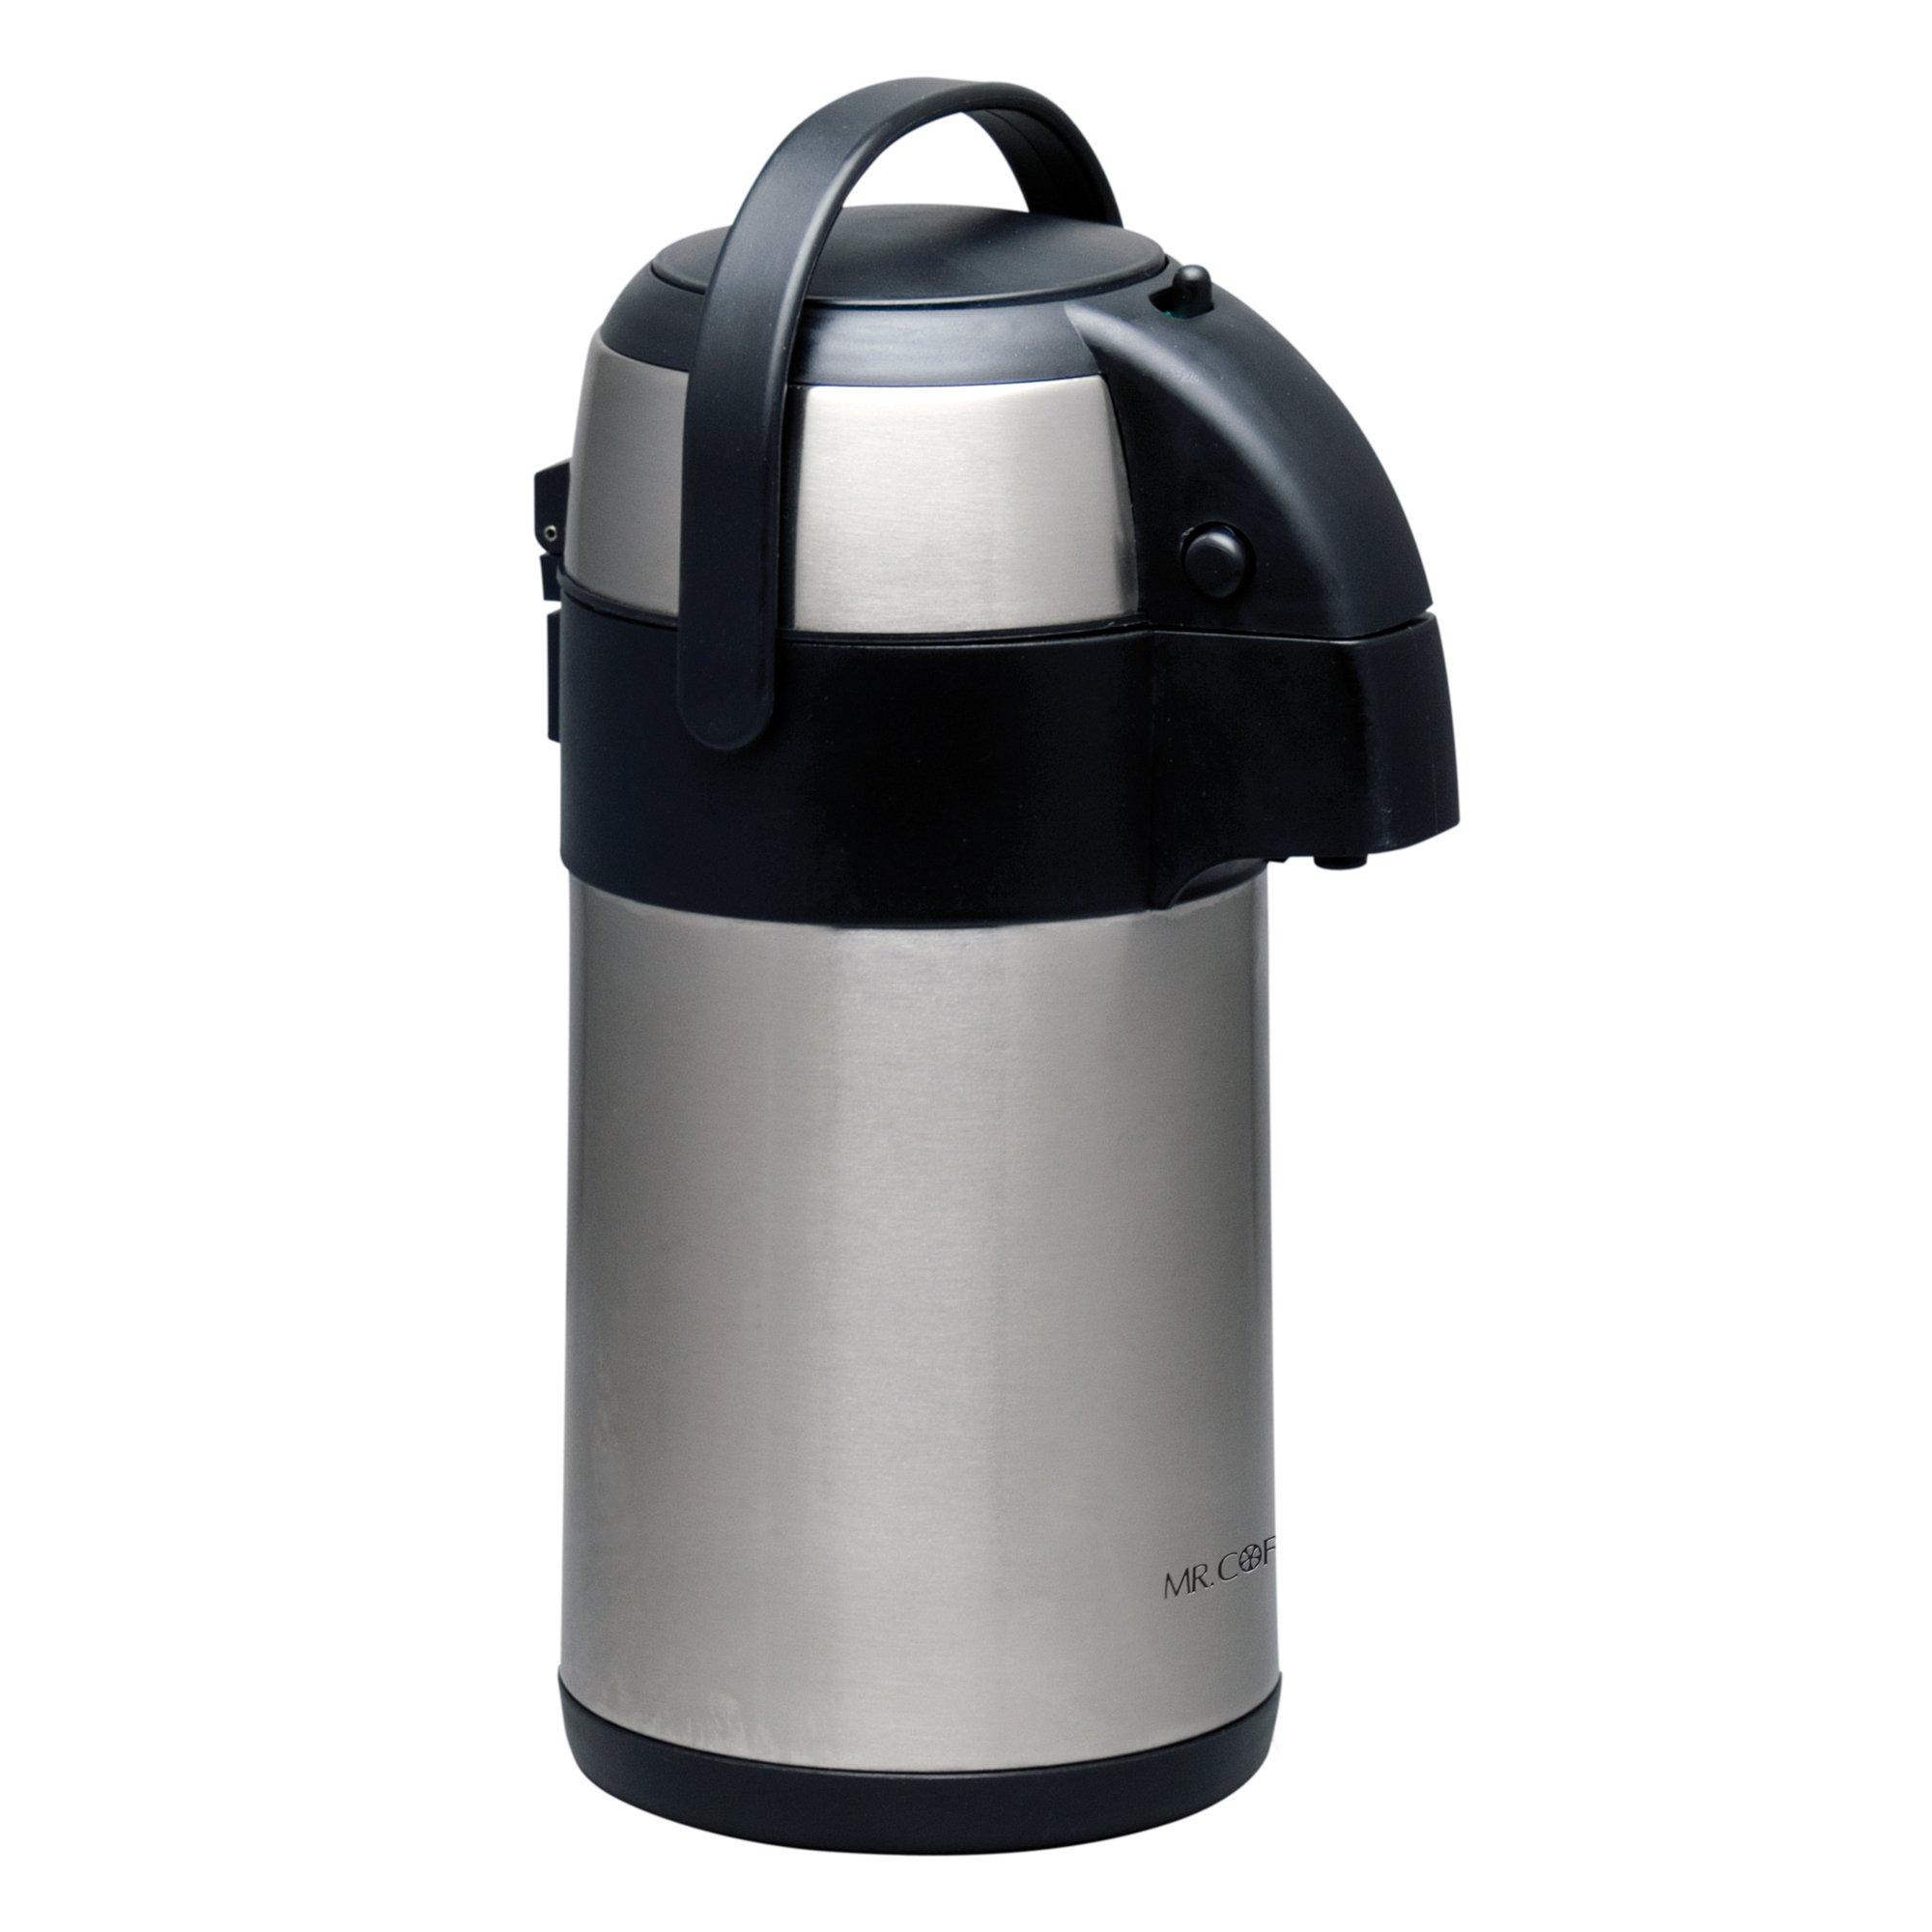 Mr Coffee 79517.01 Everflow 2.3 Quart Stainless Steel Coffee Pump Pot